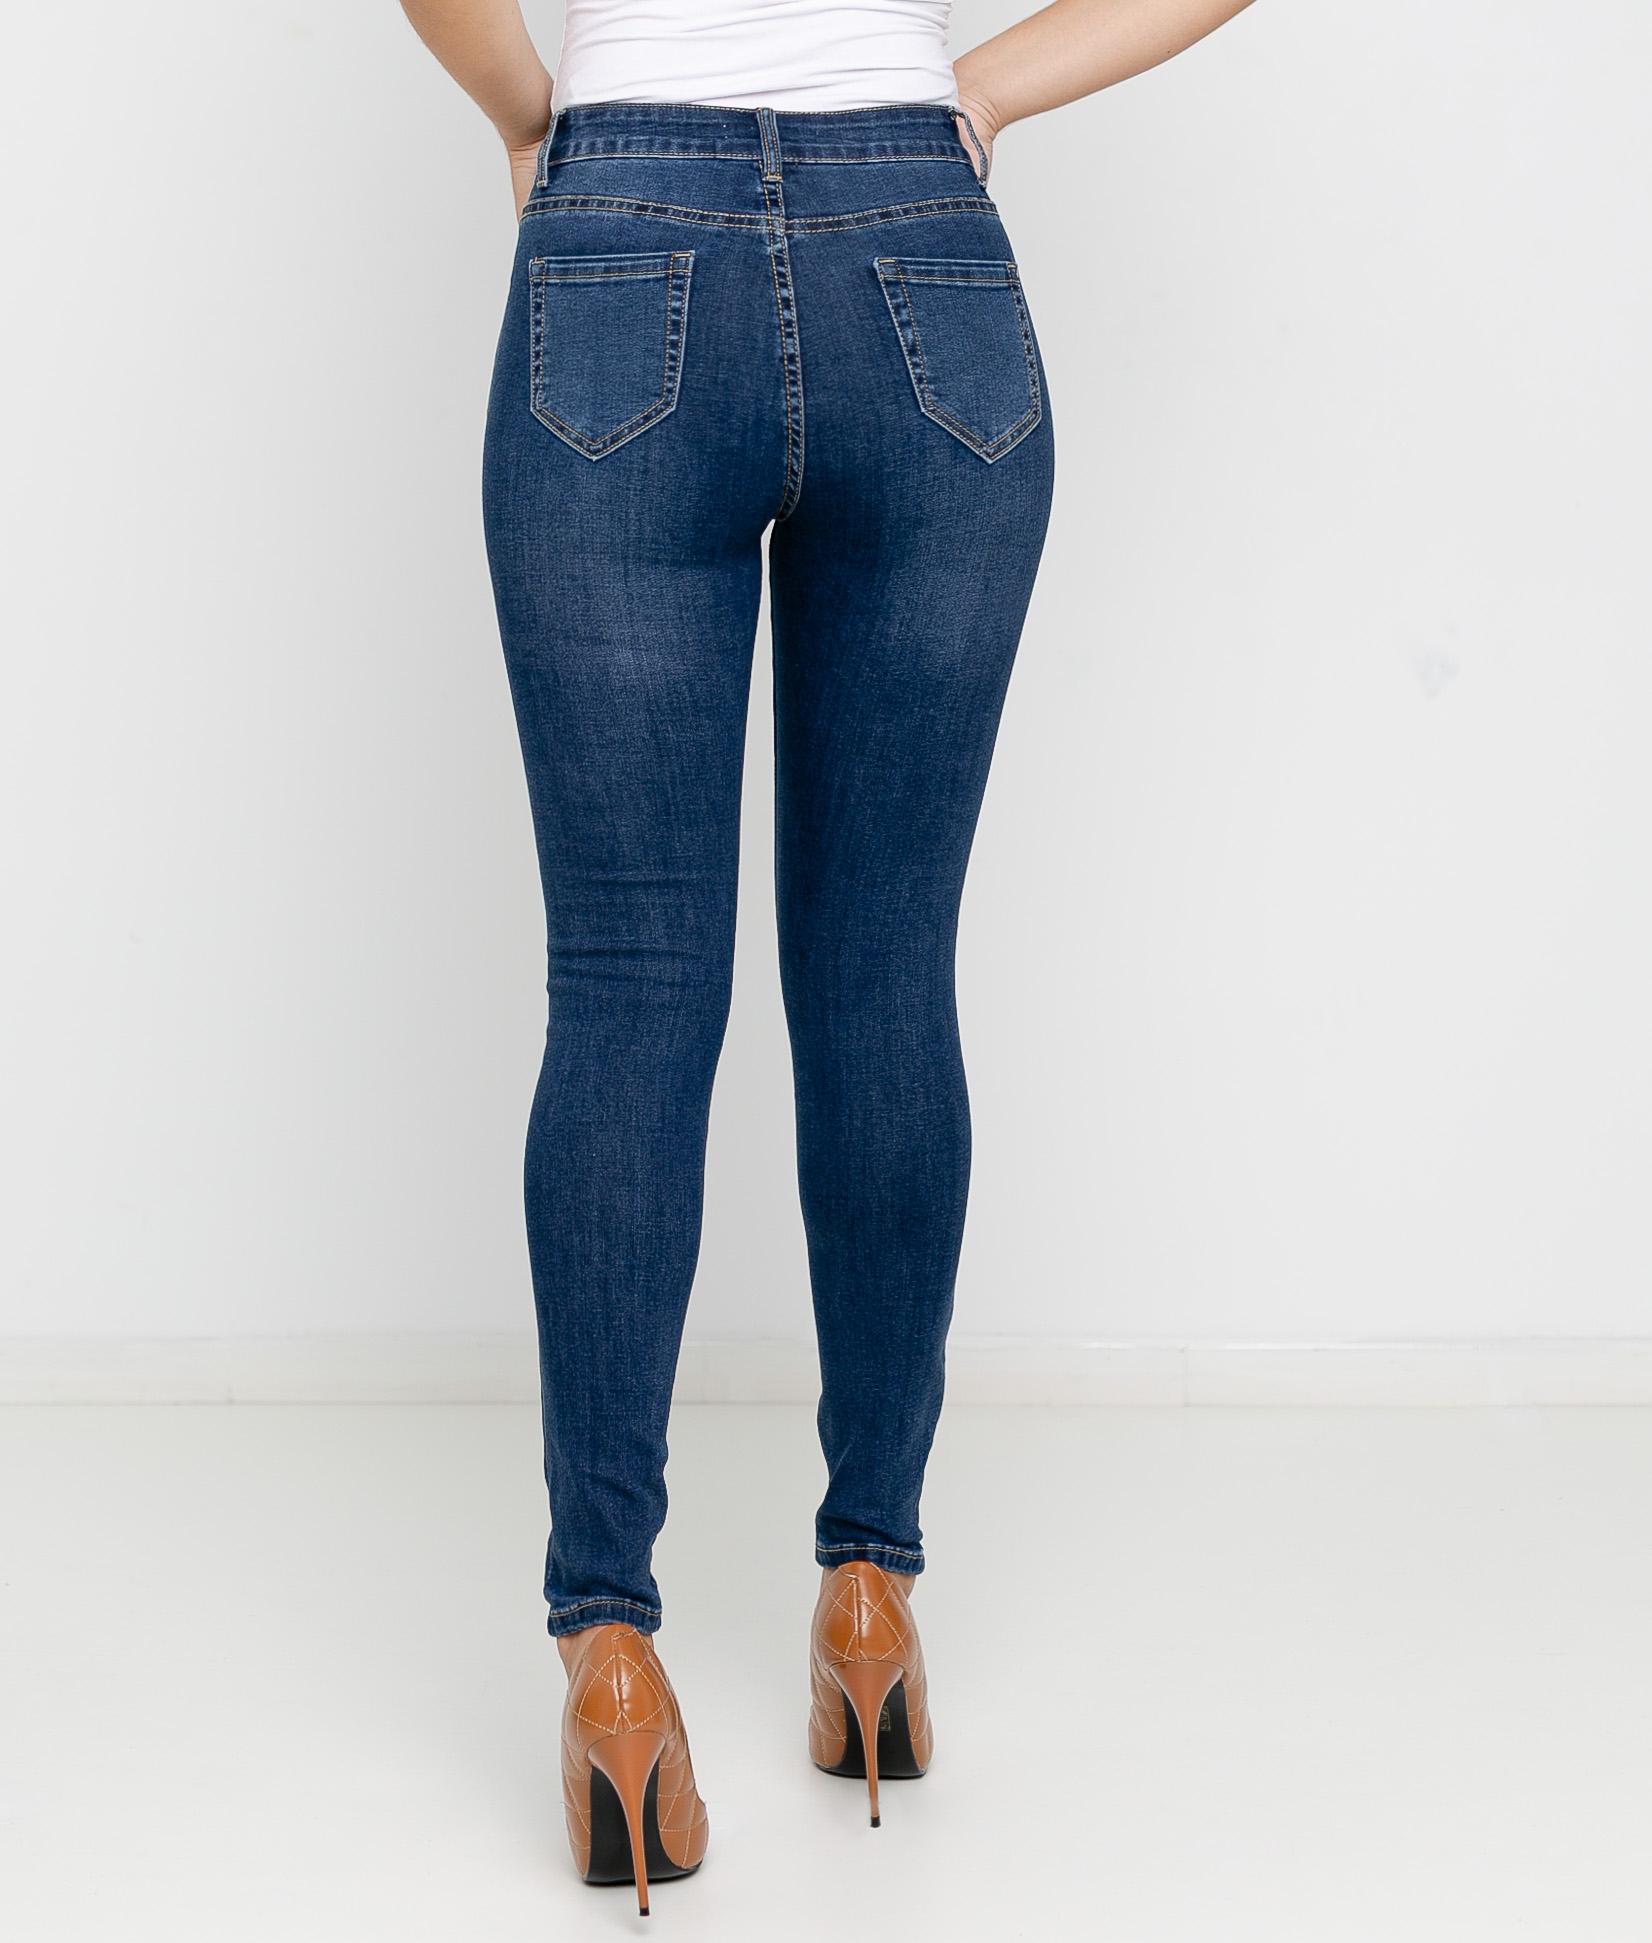 Pantalon Murphy - Denim foncé